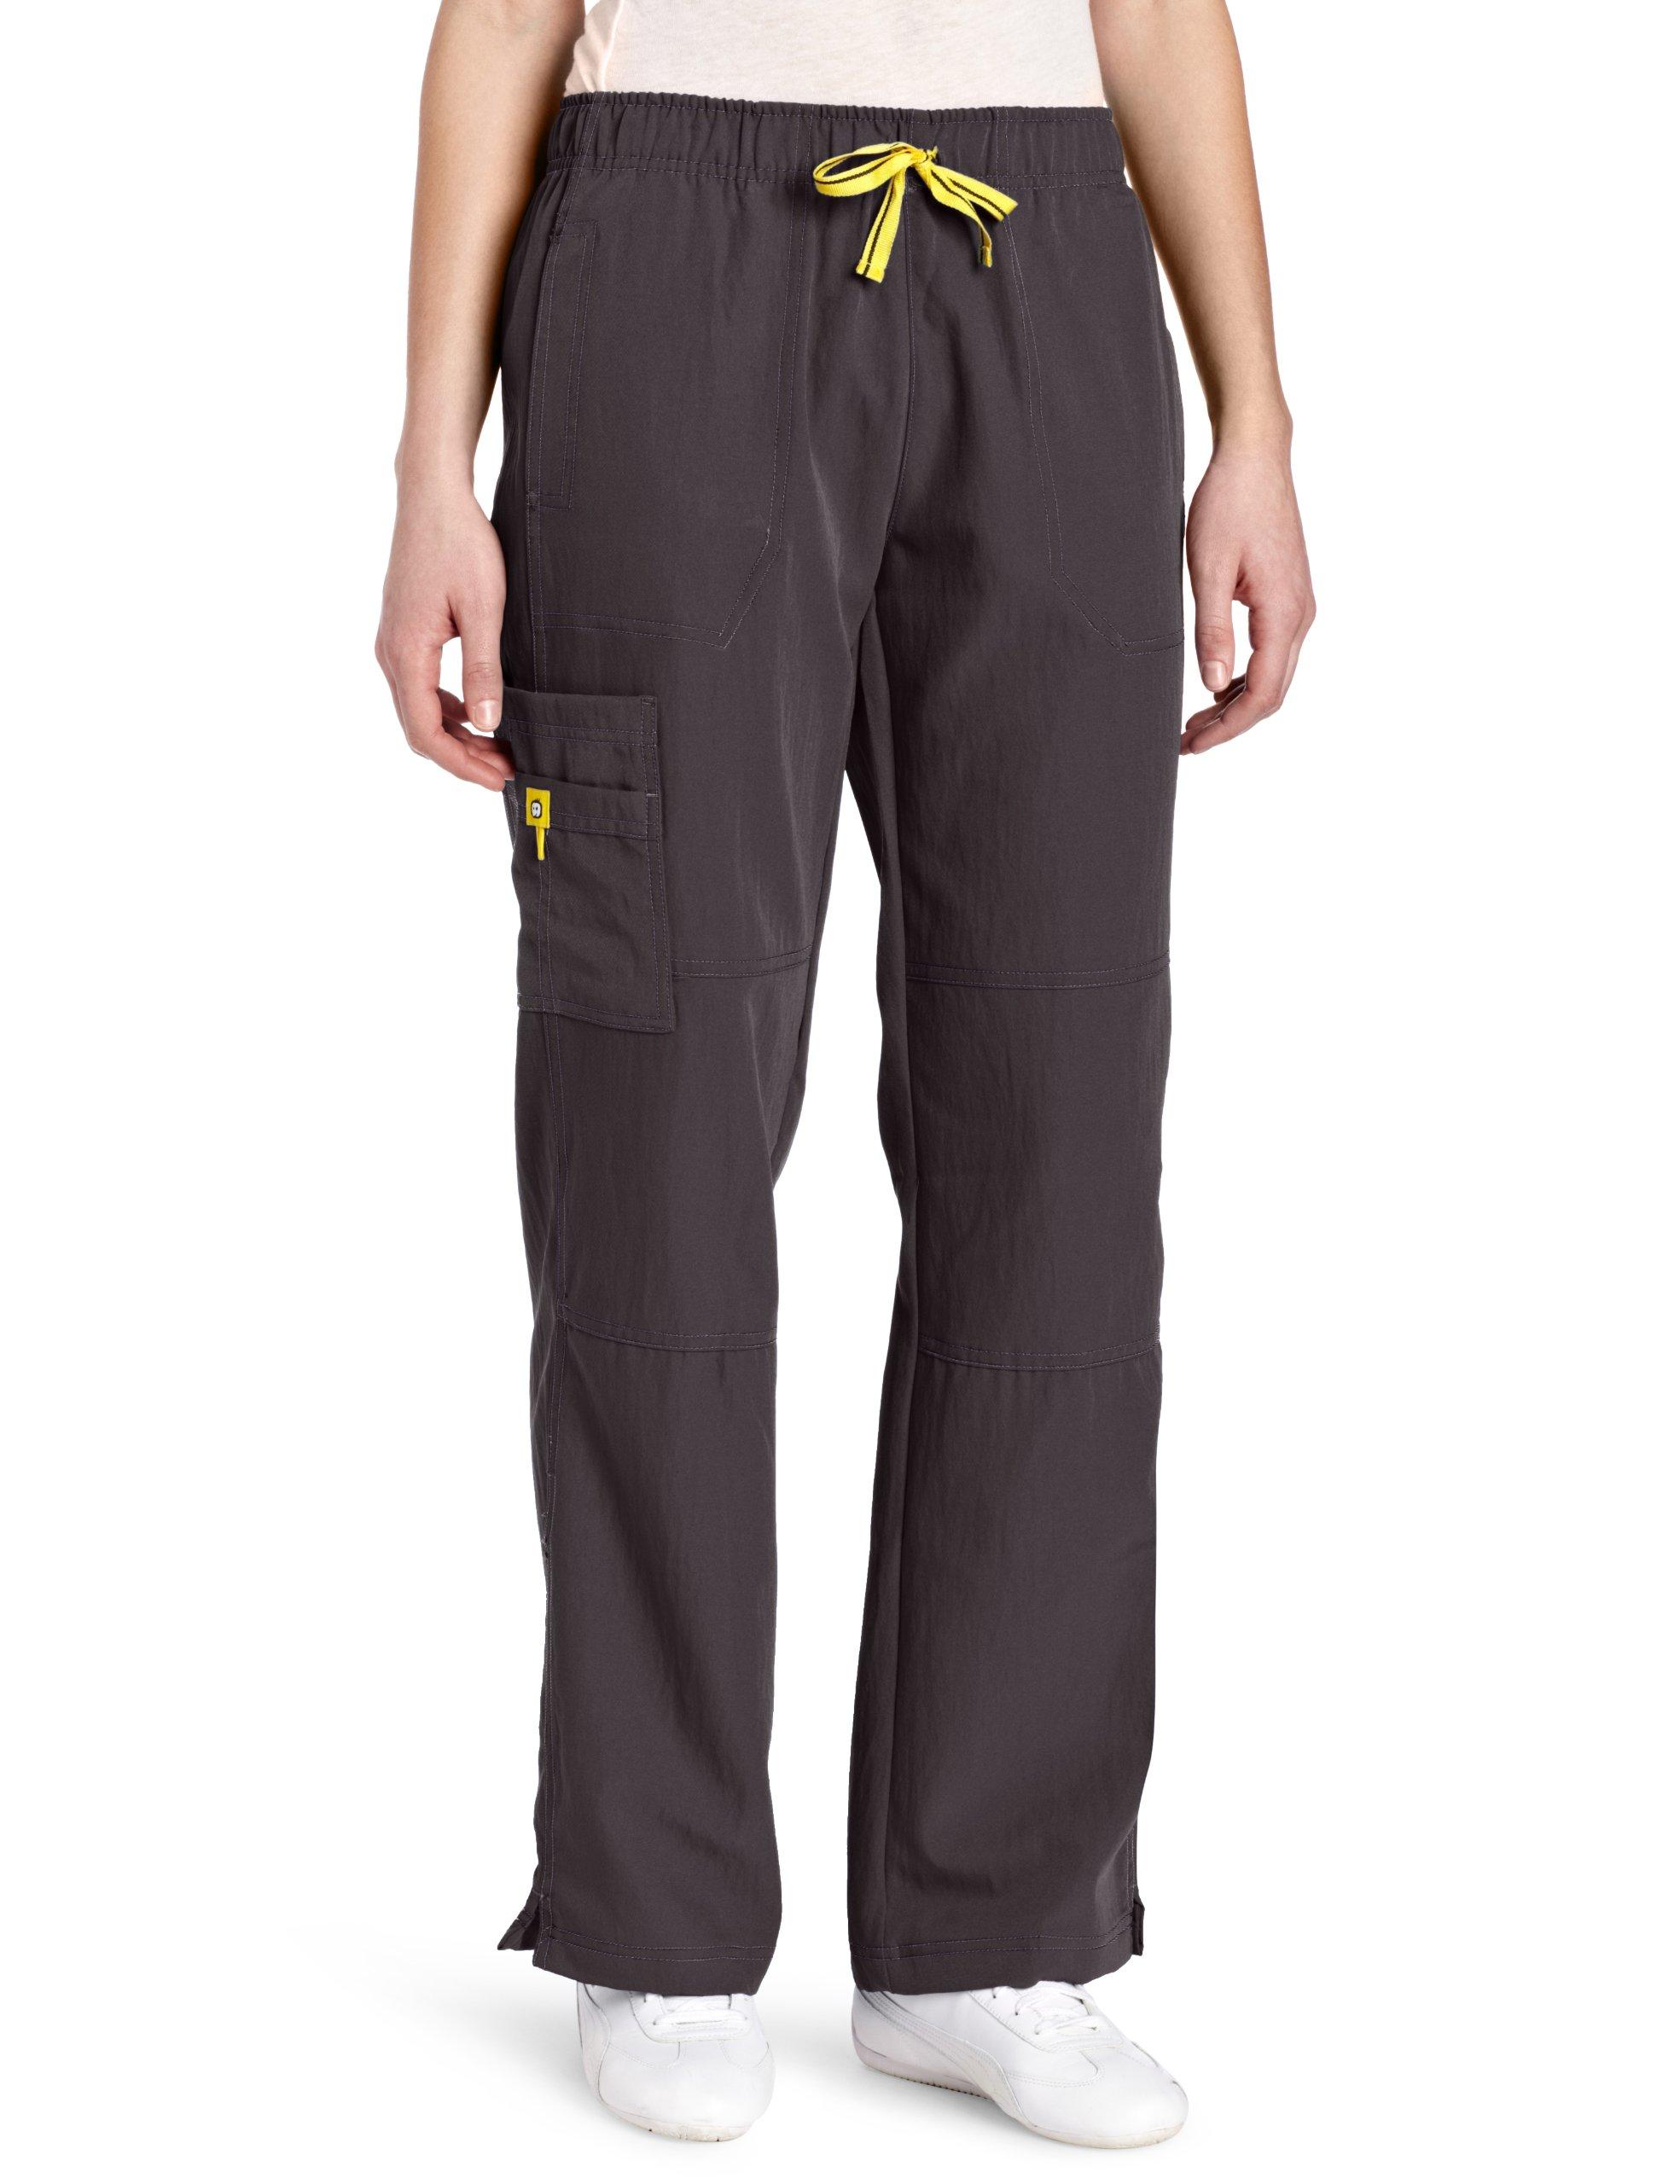 WonderWink Women's Scrubs Four Way Stretch Sporty Cargo Pant, Graphite, X-Large